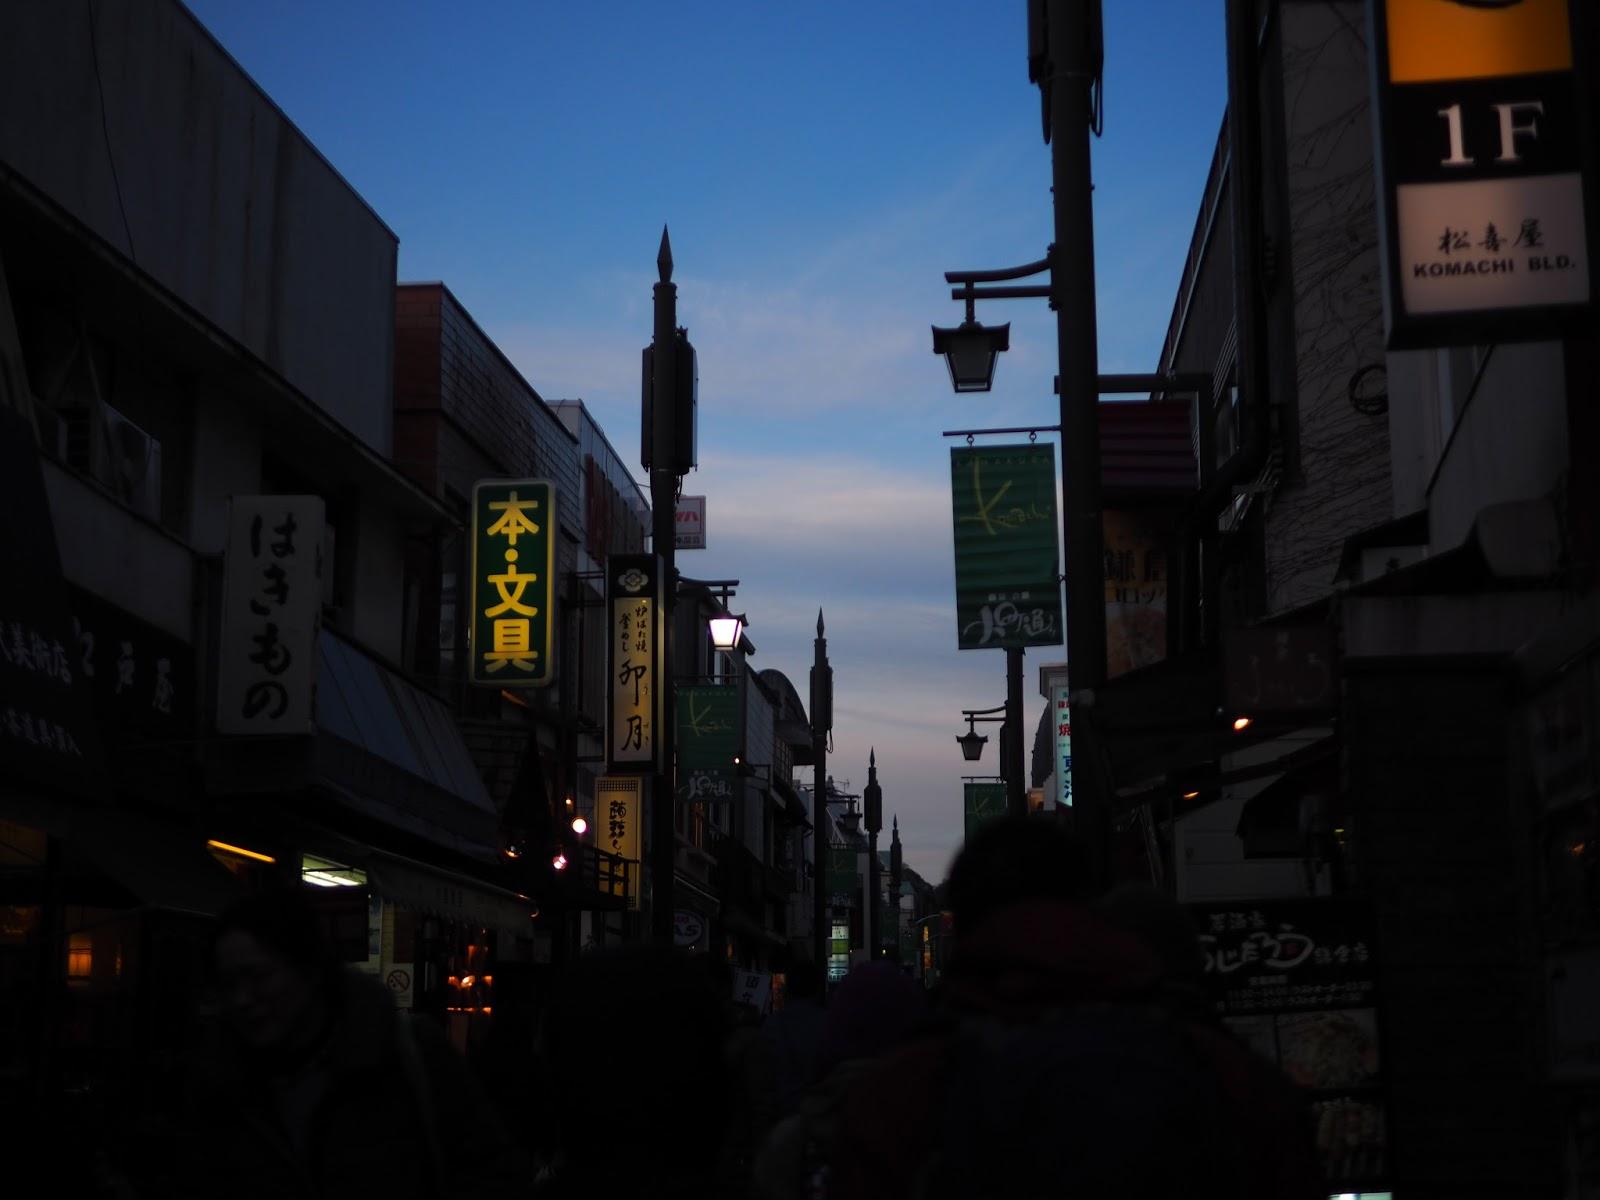 kanagawa japan street style